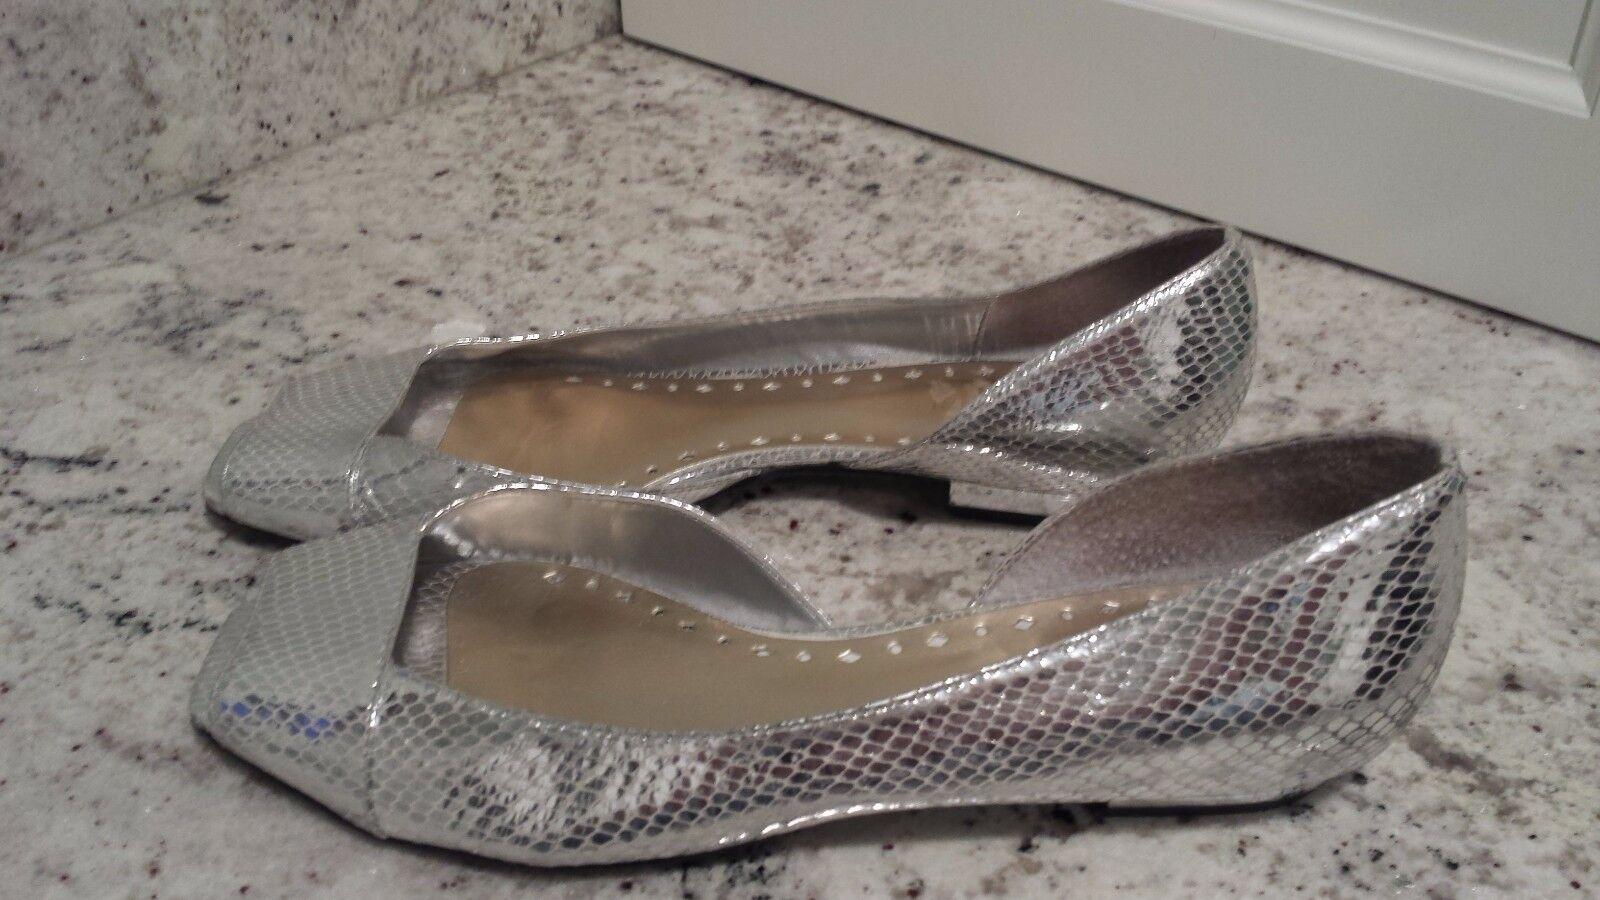 BCBG on, Generation silver flat, open toe, slip on, BCBG snakeskin, leather, brazil, 7.5B 07e176